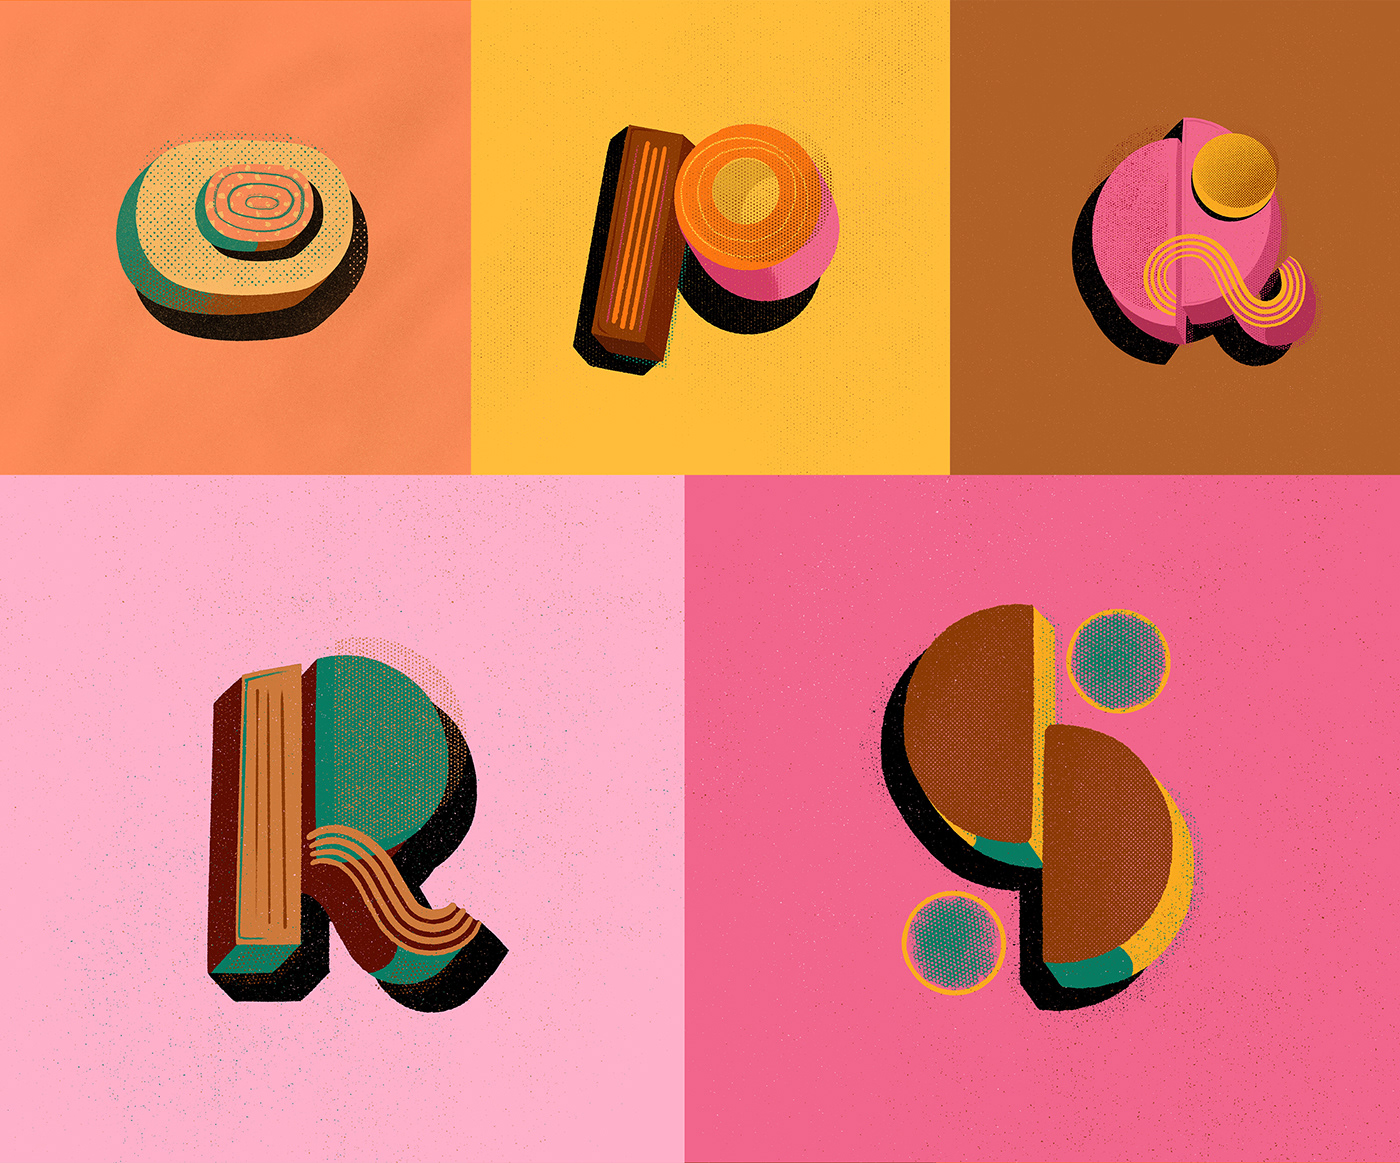 Typography,Calligraphy,Graphic Design